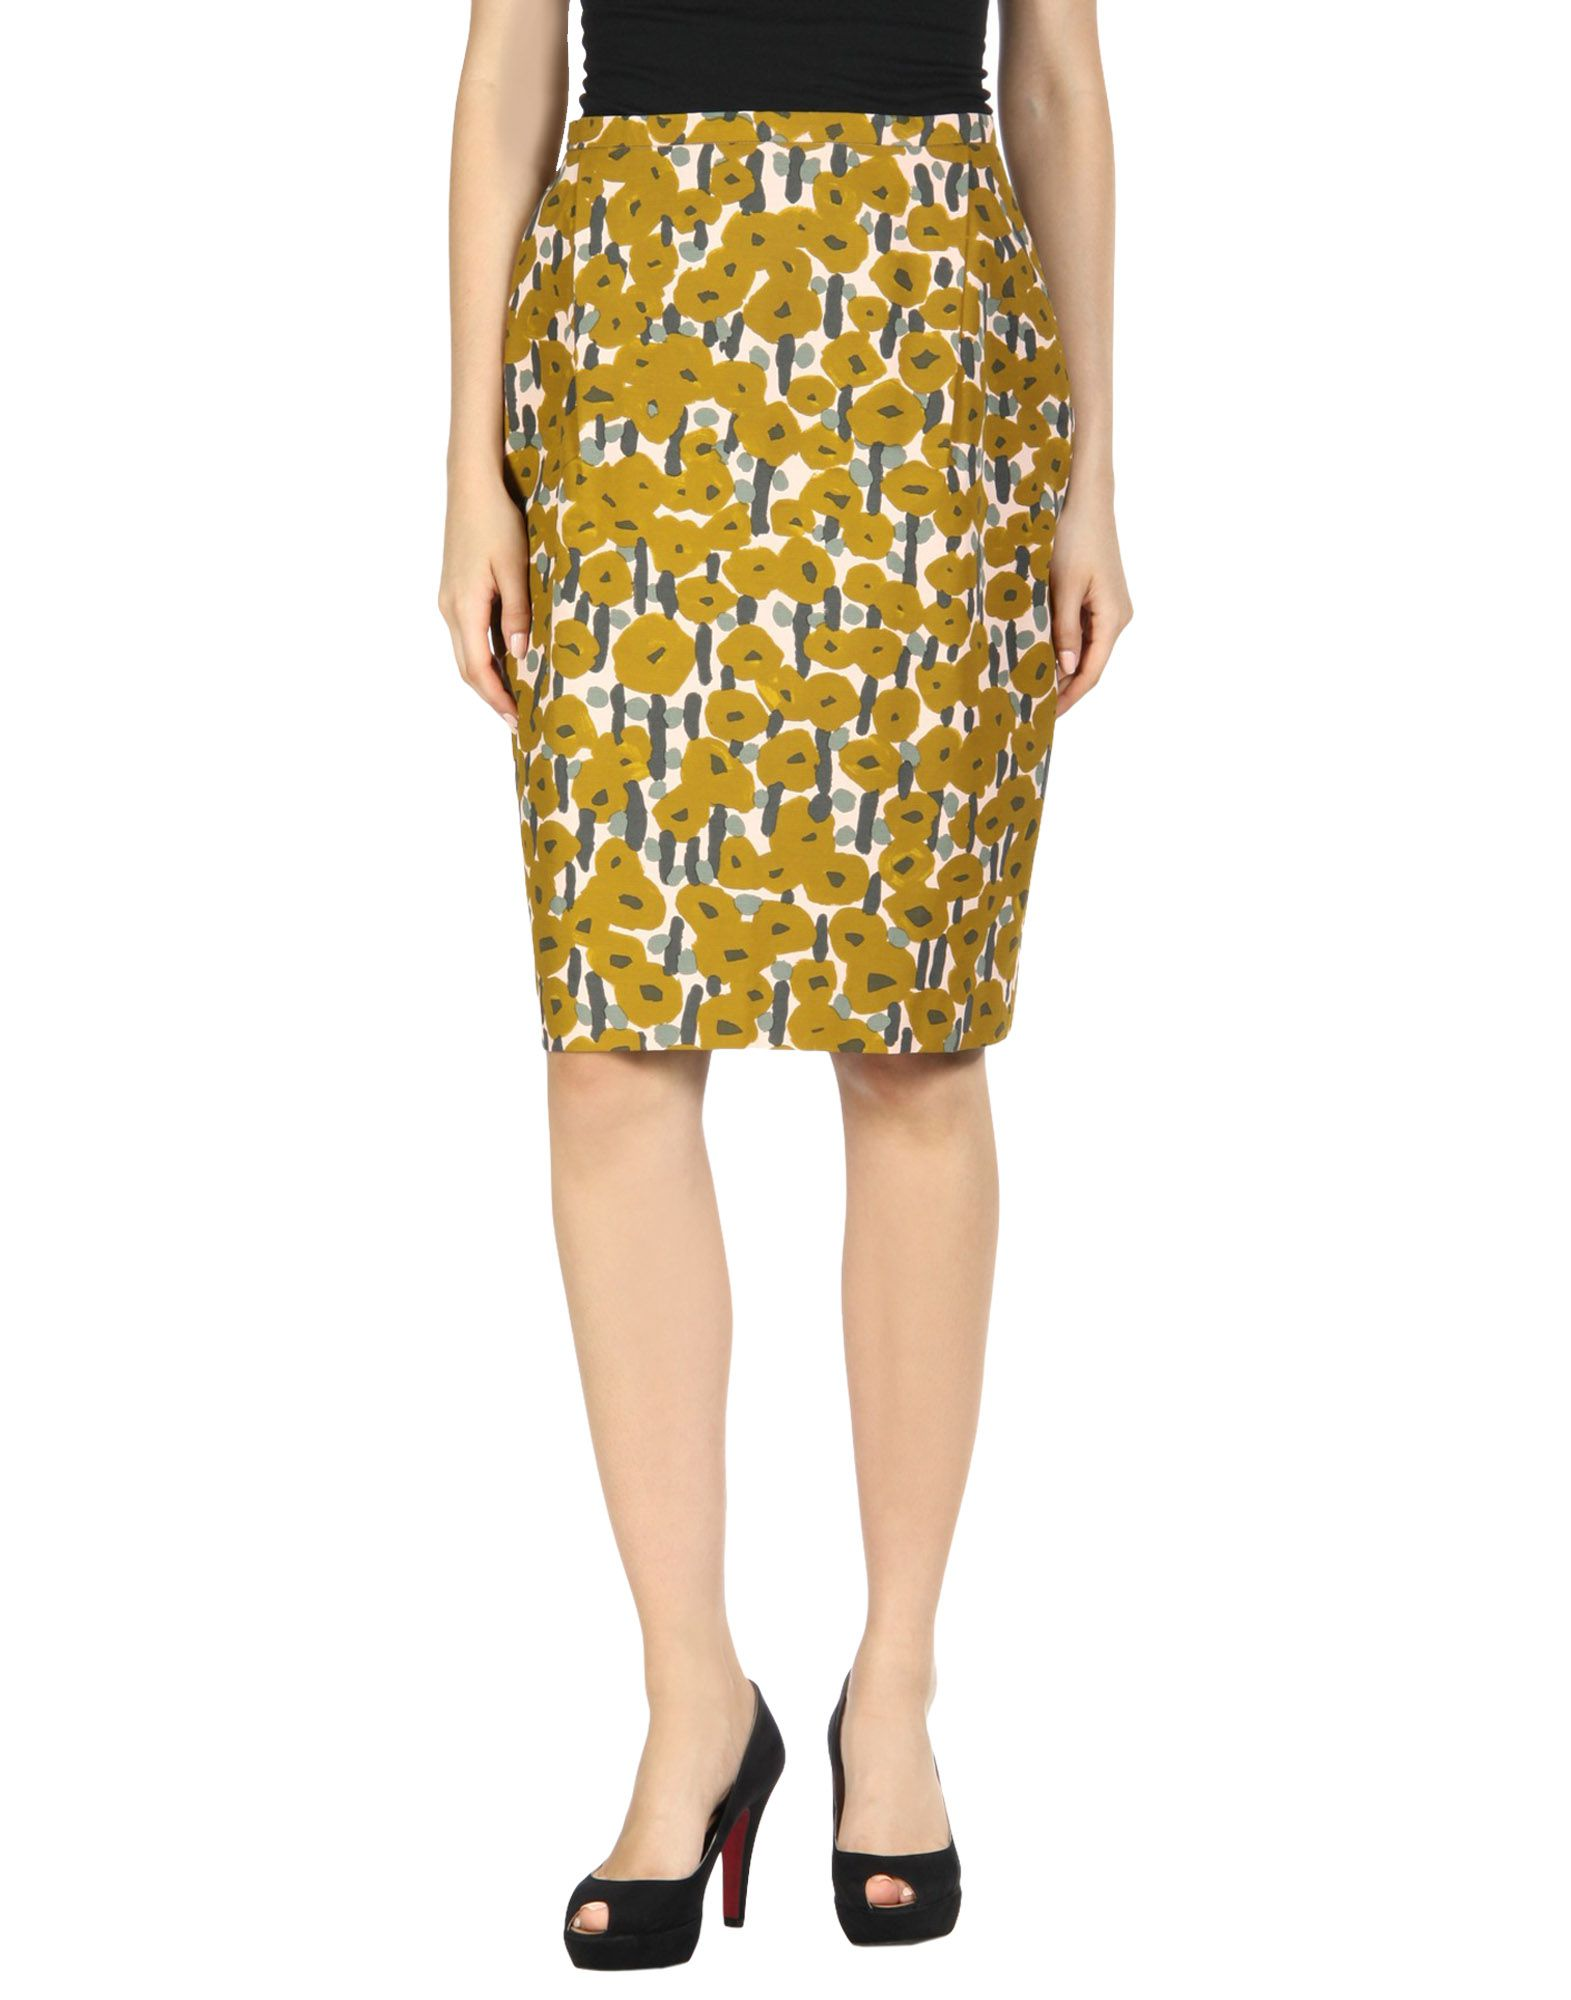 MINÄ PERHONEN Knee Length Skirt in Ocher